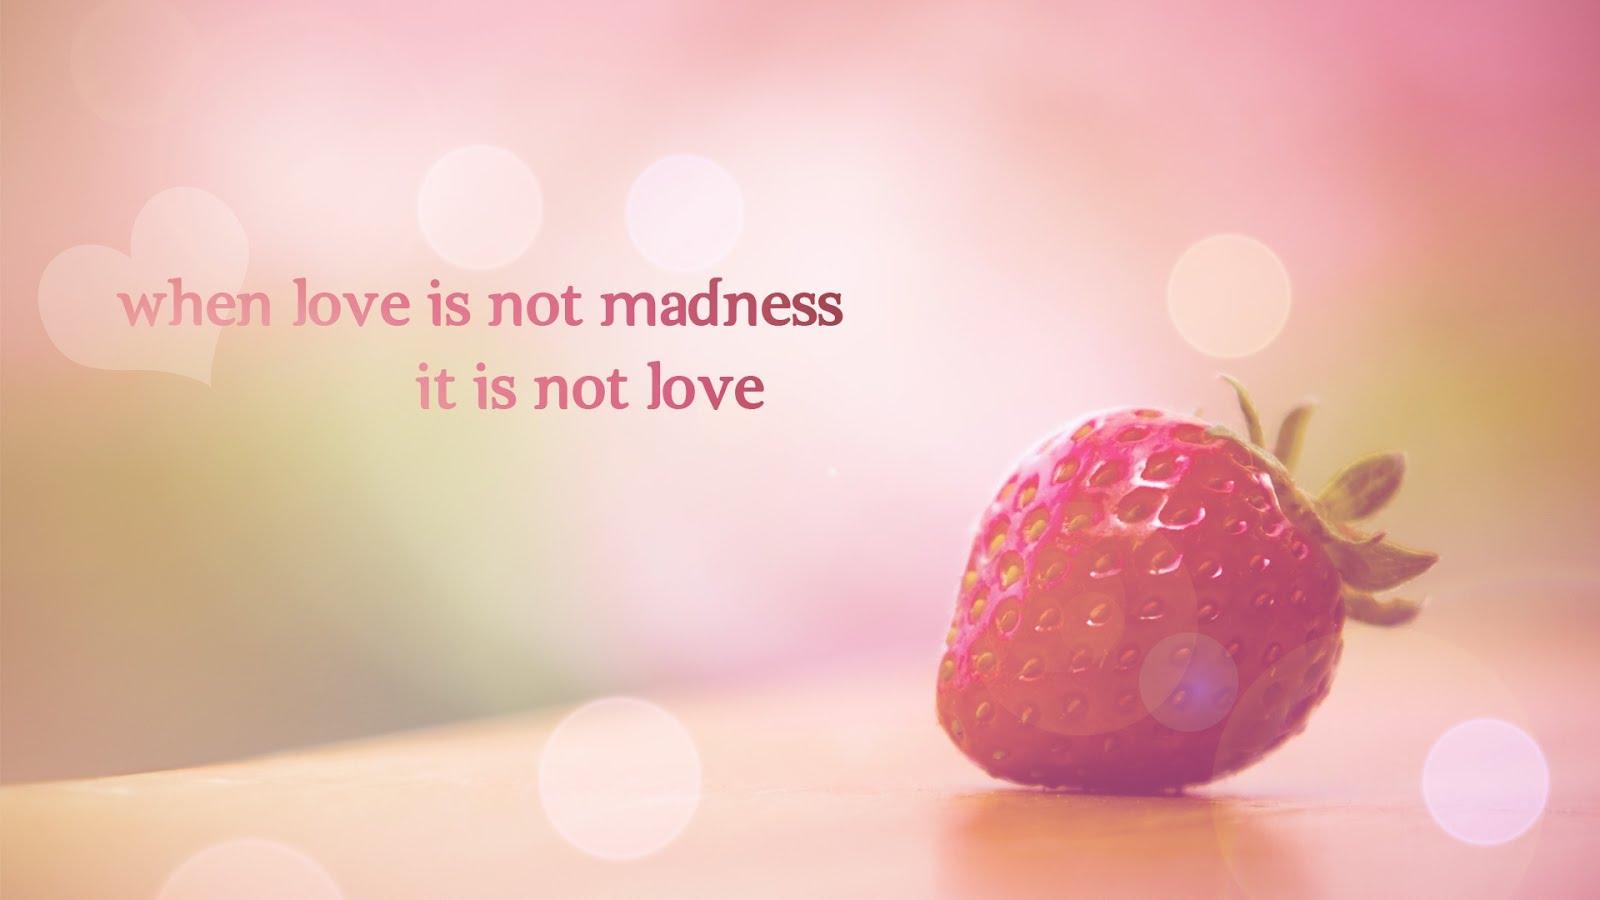 Iphone Wallpaper Tumblr Love Quotes